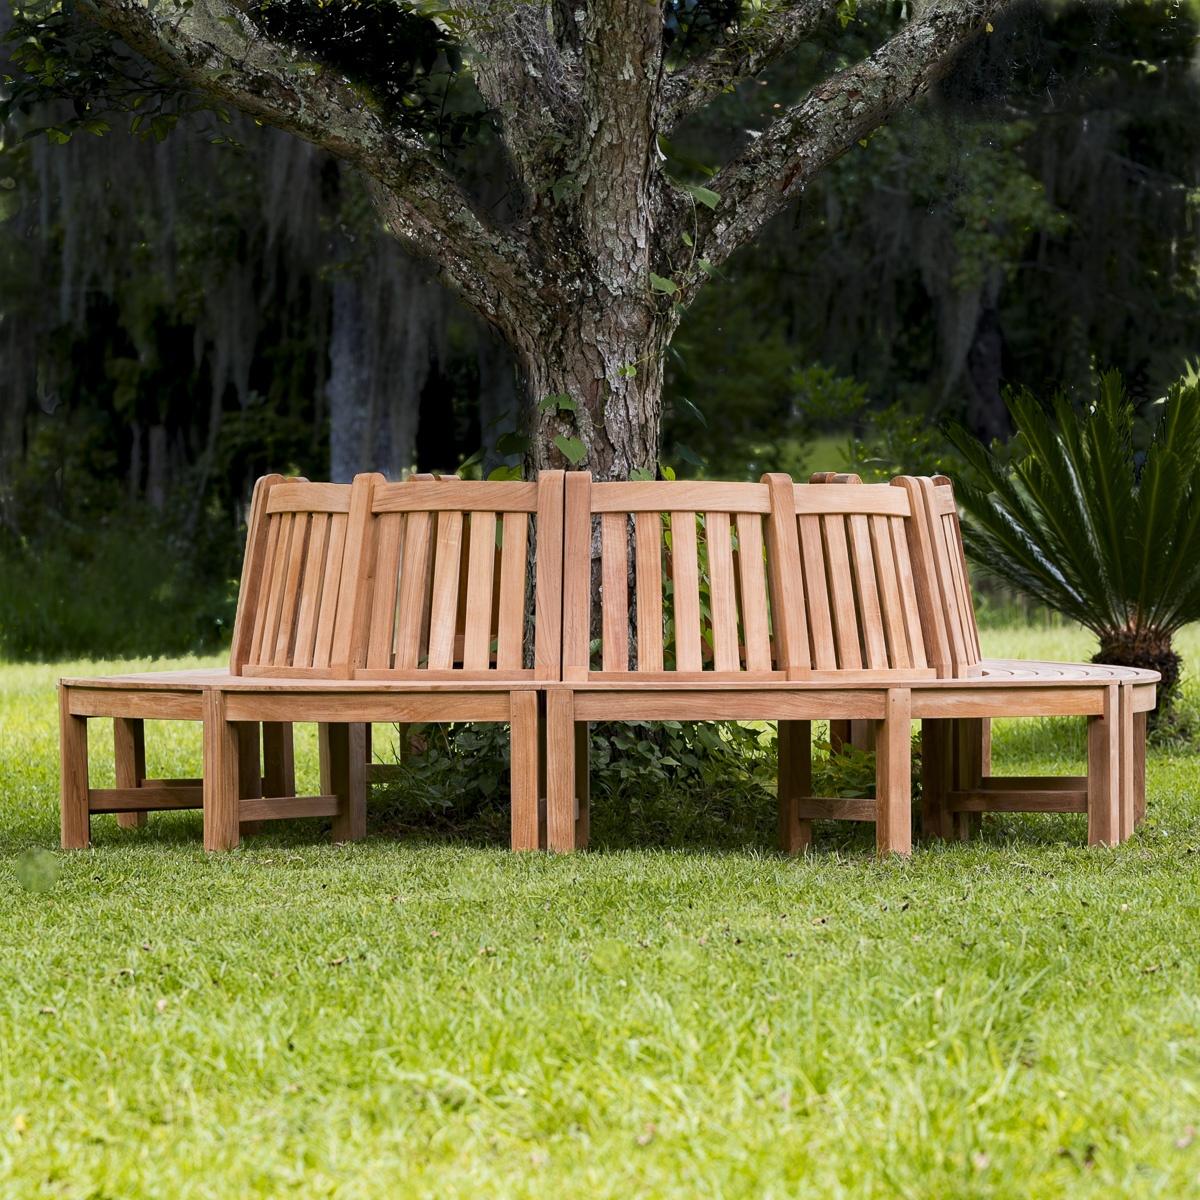 Westminster Teak Tree Trunk Bench Surrounds Tree Westminster Teak Outdoor Furniture